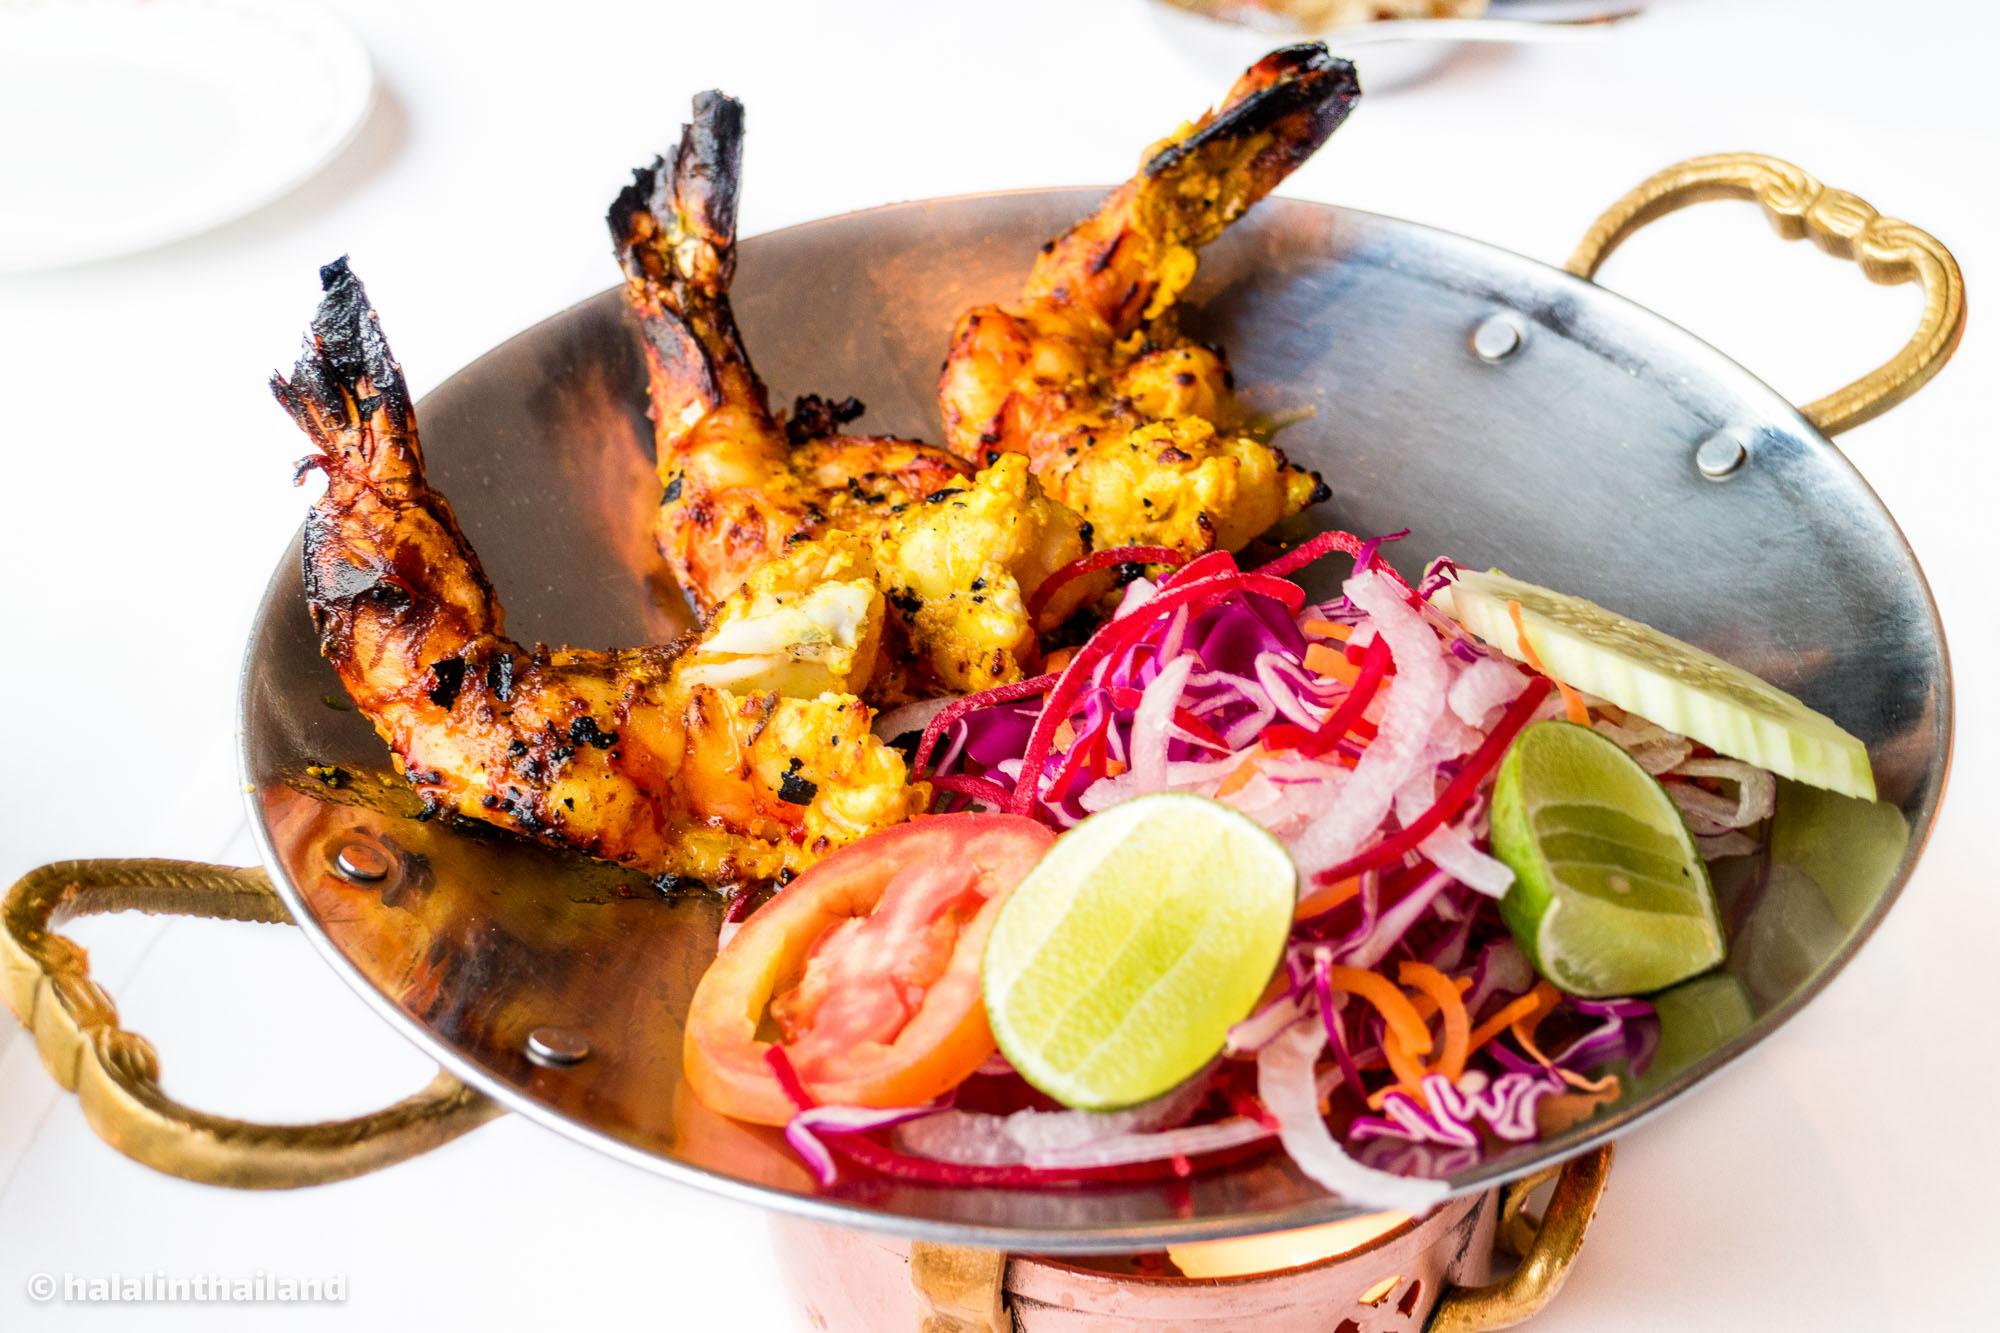 Badsahi jheenga tandoori - Cottage Cheese • Rang Mahal รางมาฮาล โรงแรมแรมแบรนดท์ กรุเทพฯ